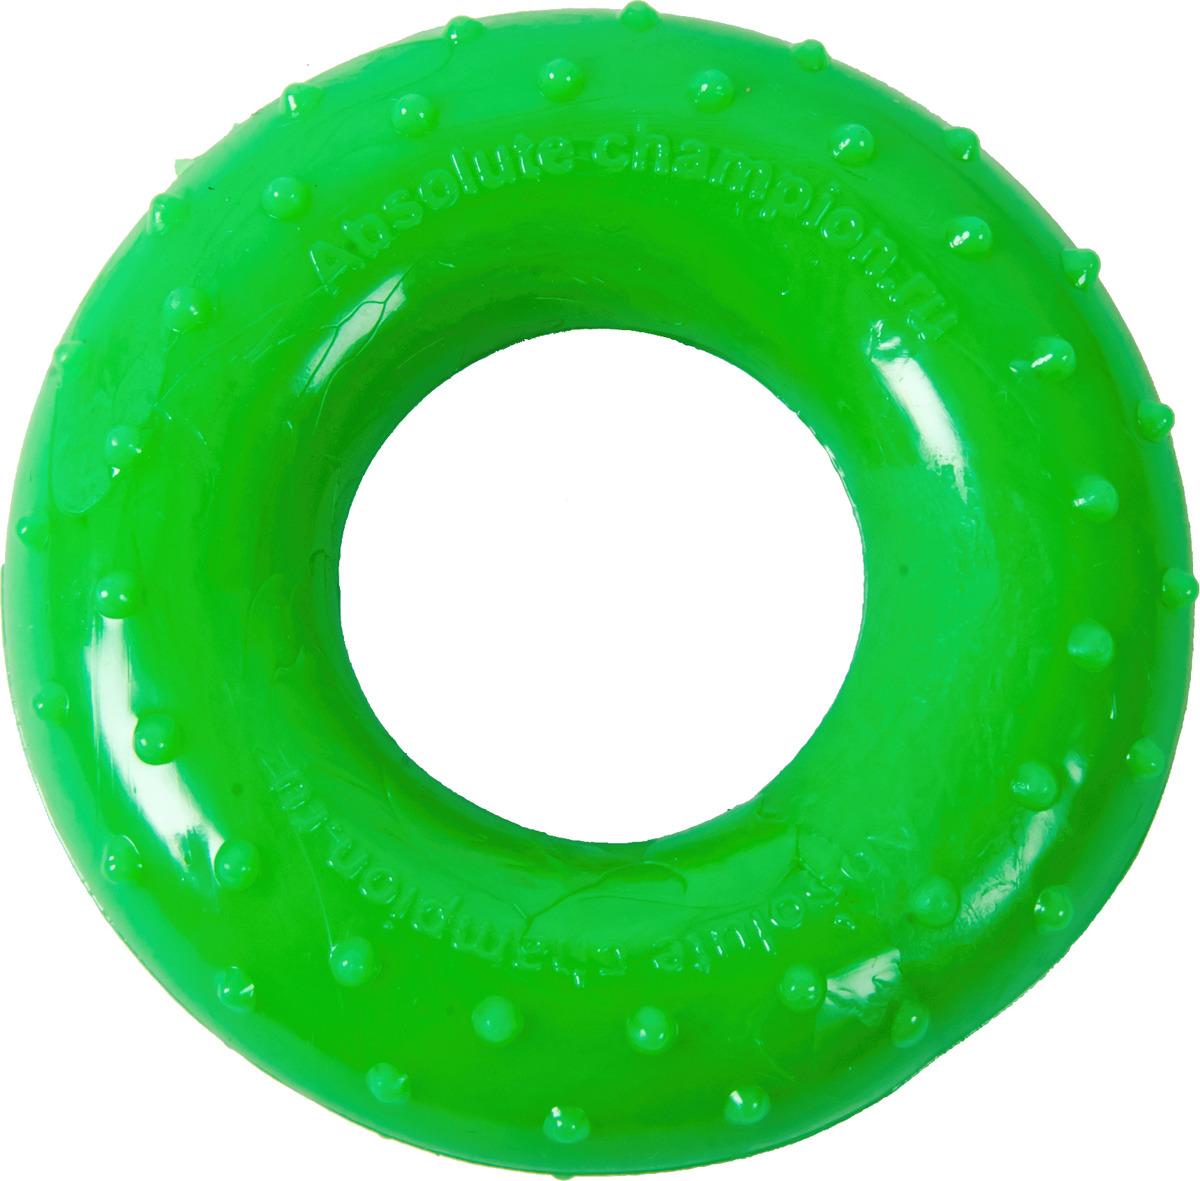 Эспандер Absolute Champion, 4630005460576, зеленый, усилие 25 кг